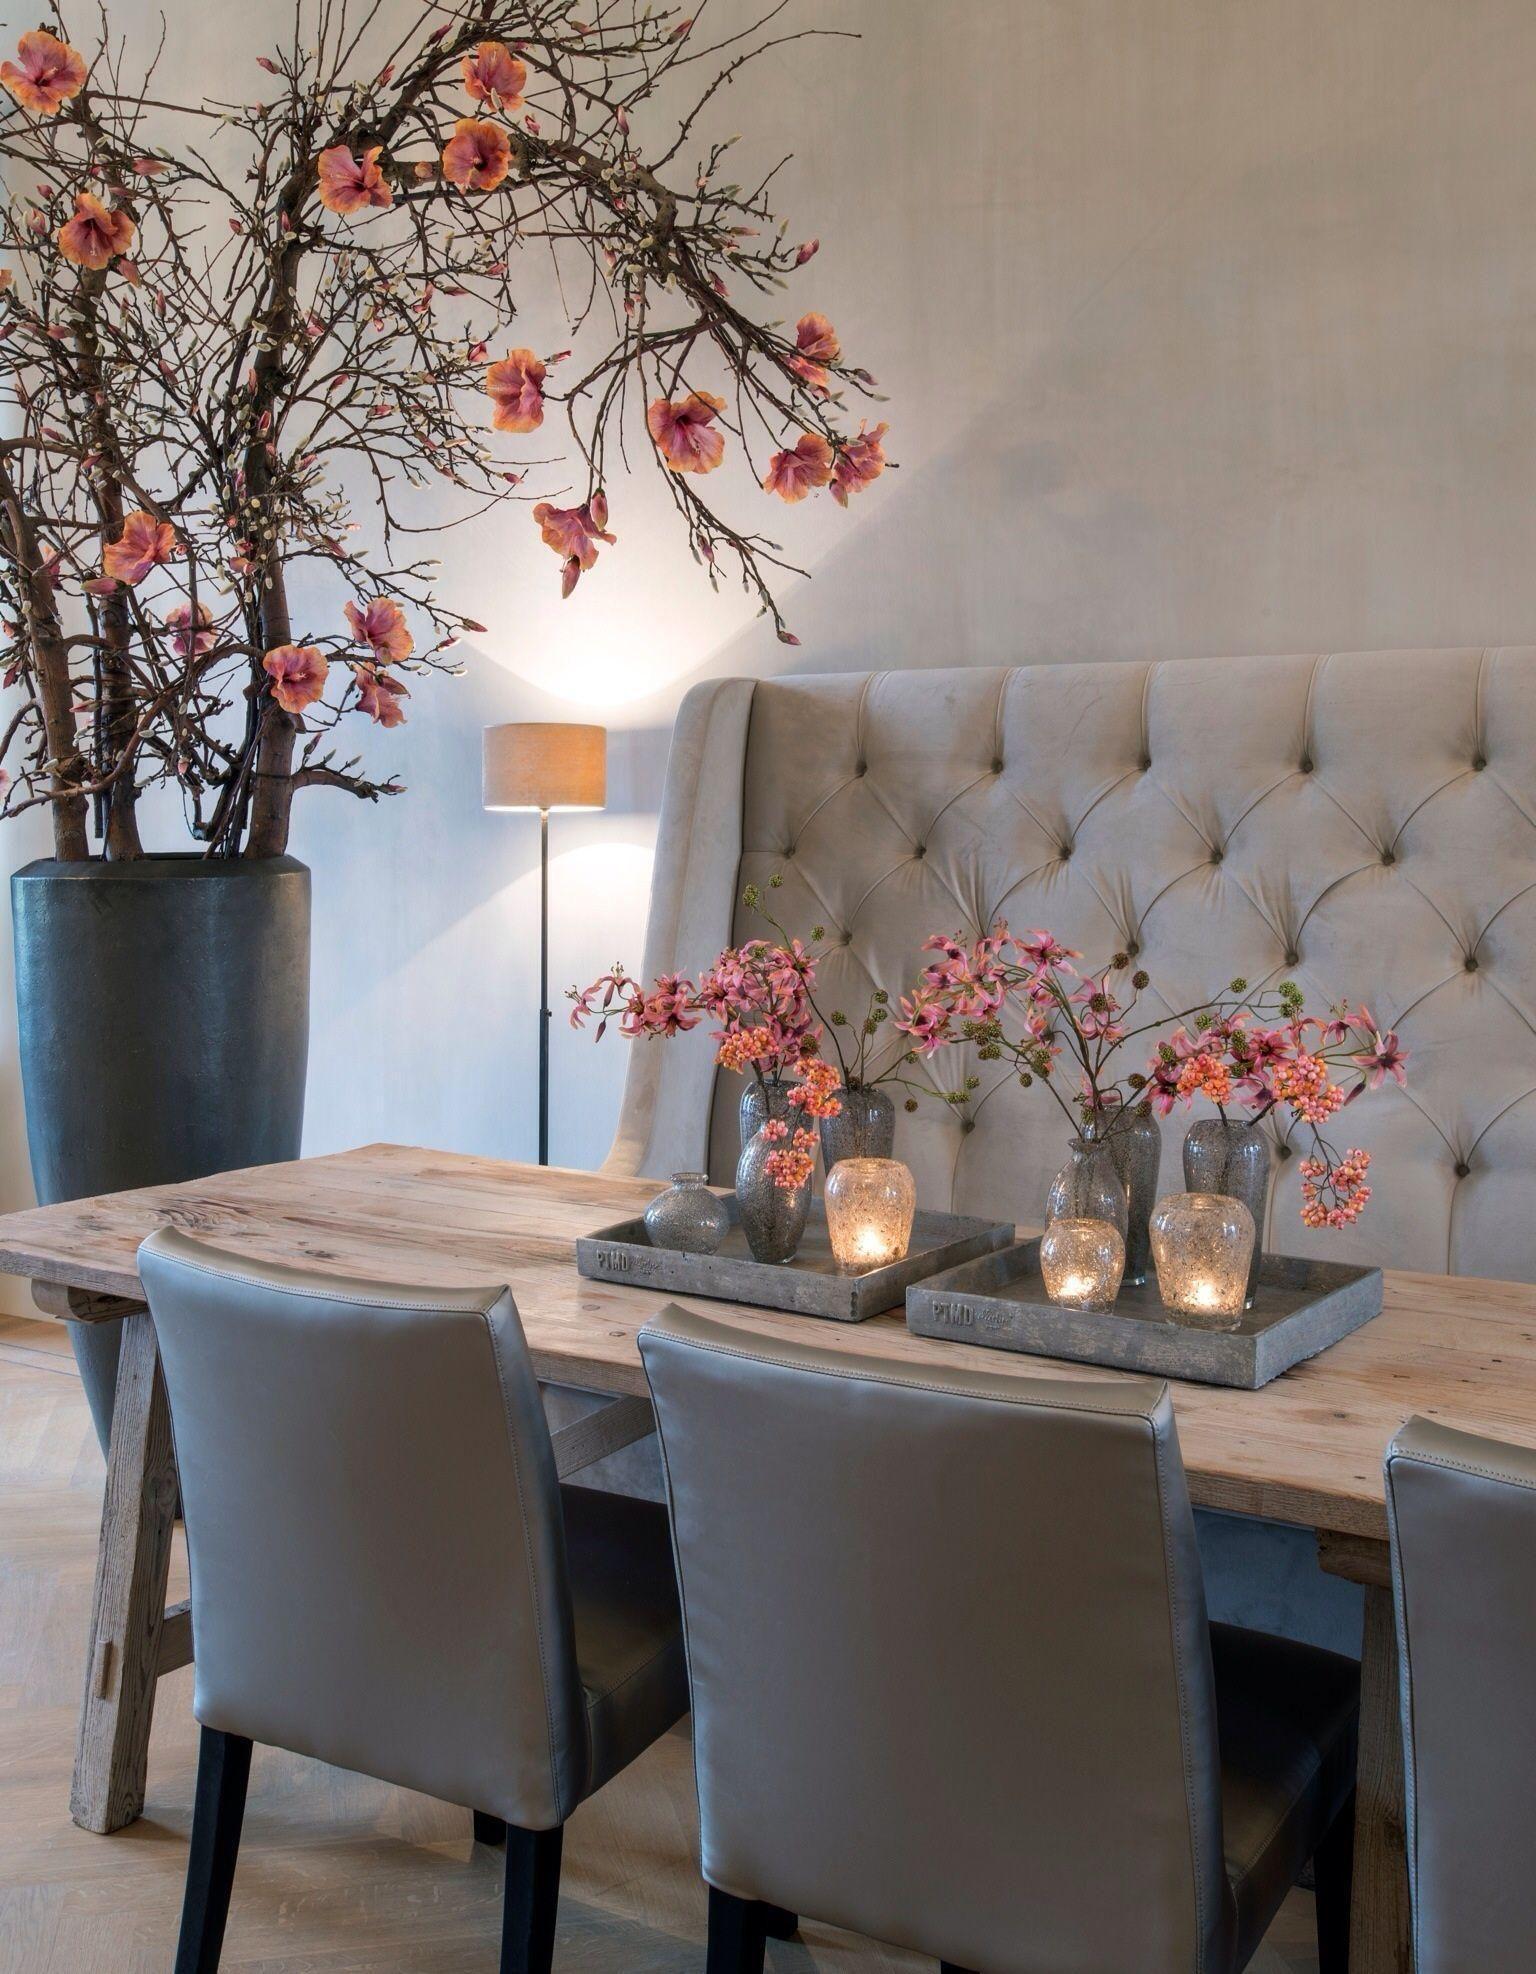 9 Best Dining Table Centerpiece Ideas   dining table centerpiece ...